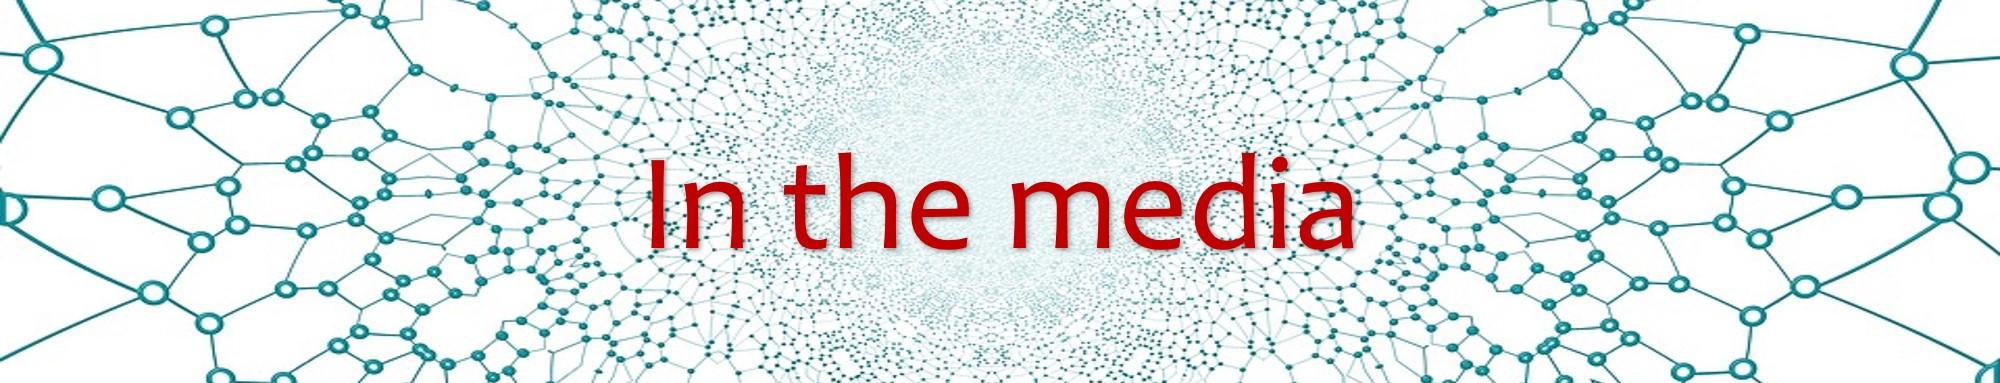 Media - Title